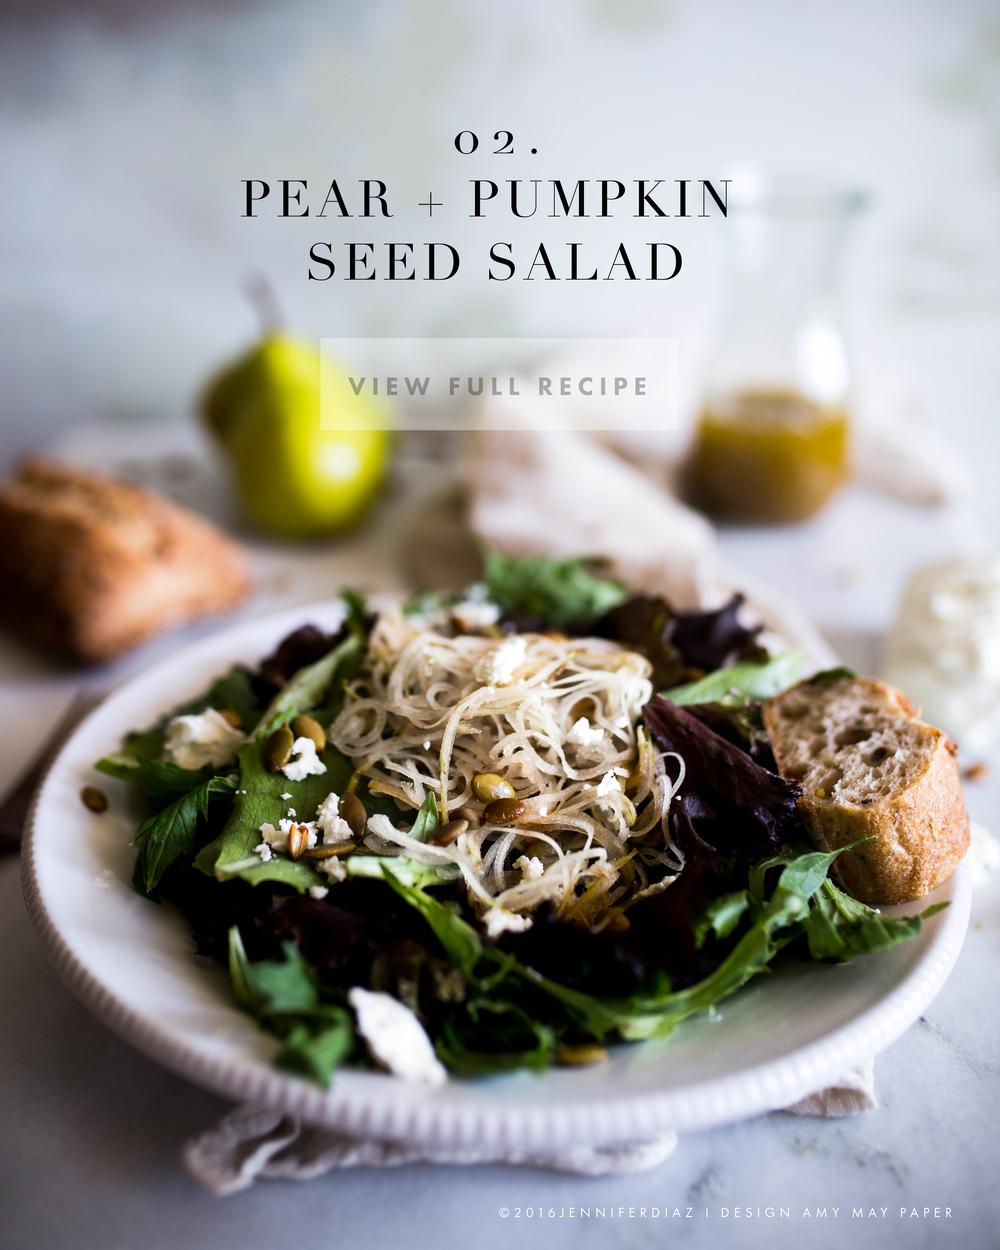 ©2016 Jennifer Diaz I Pear + Pumpkin Seed Salad with Amy May Paper